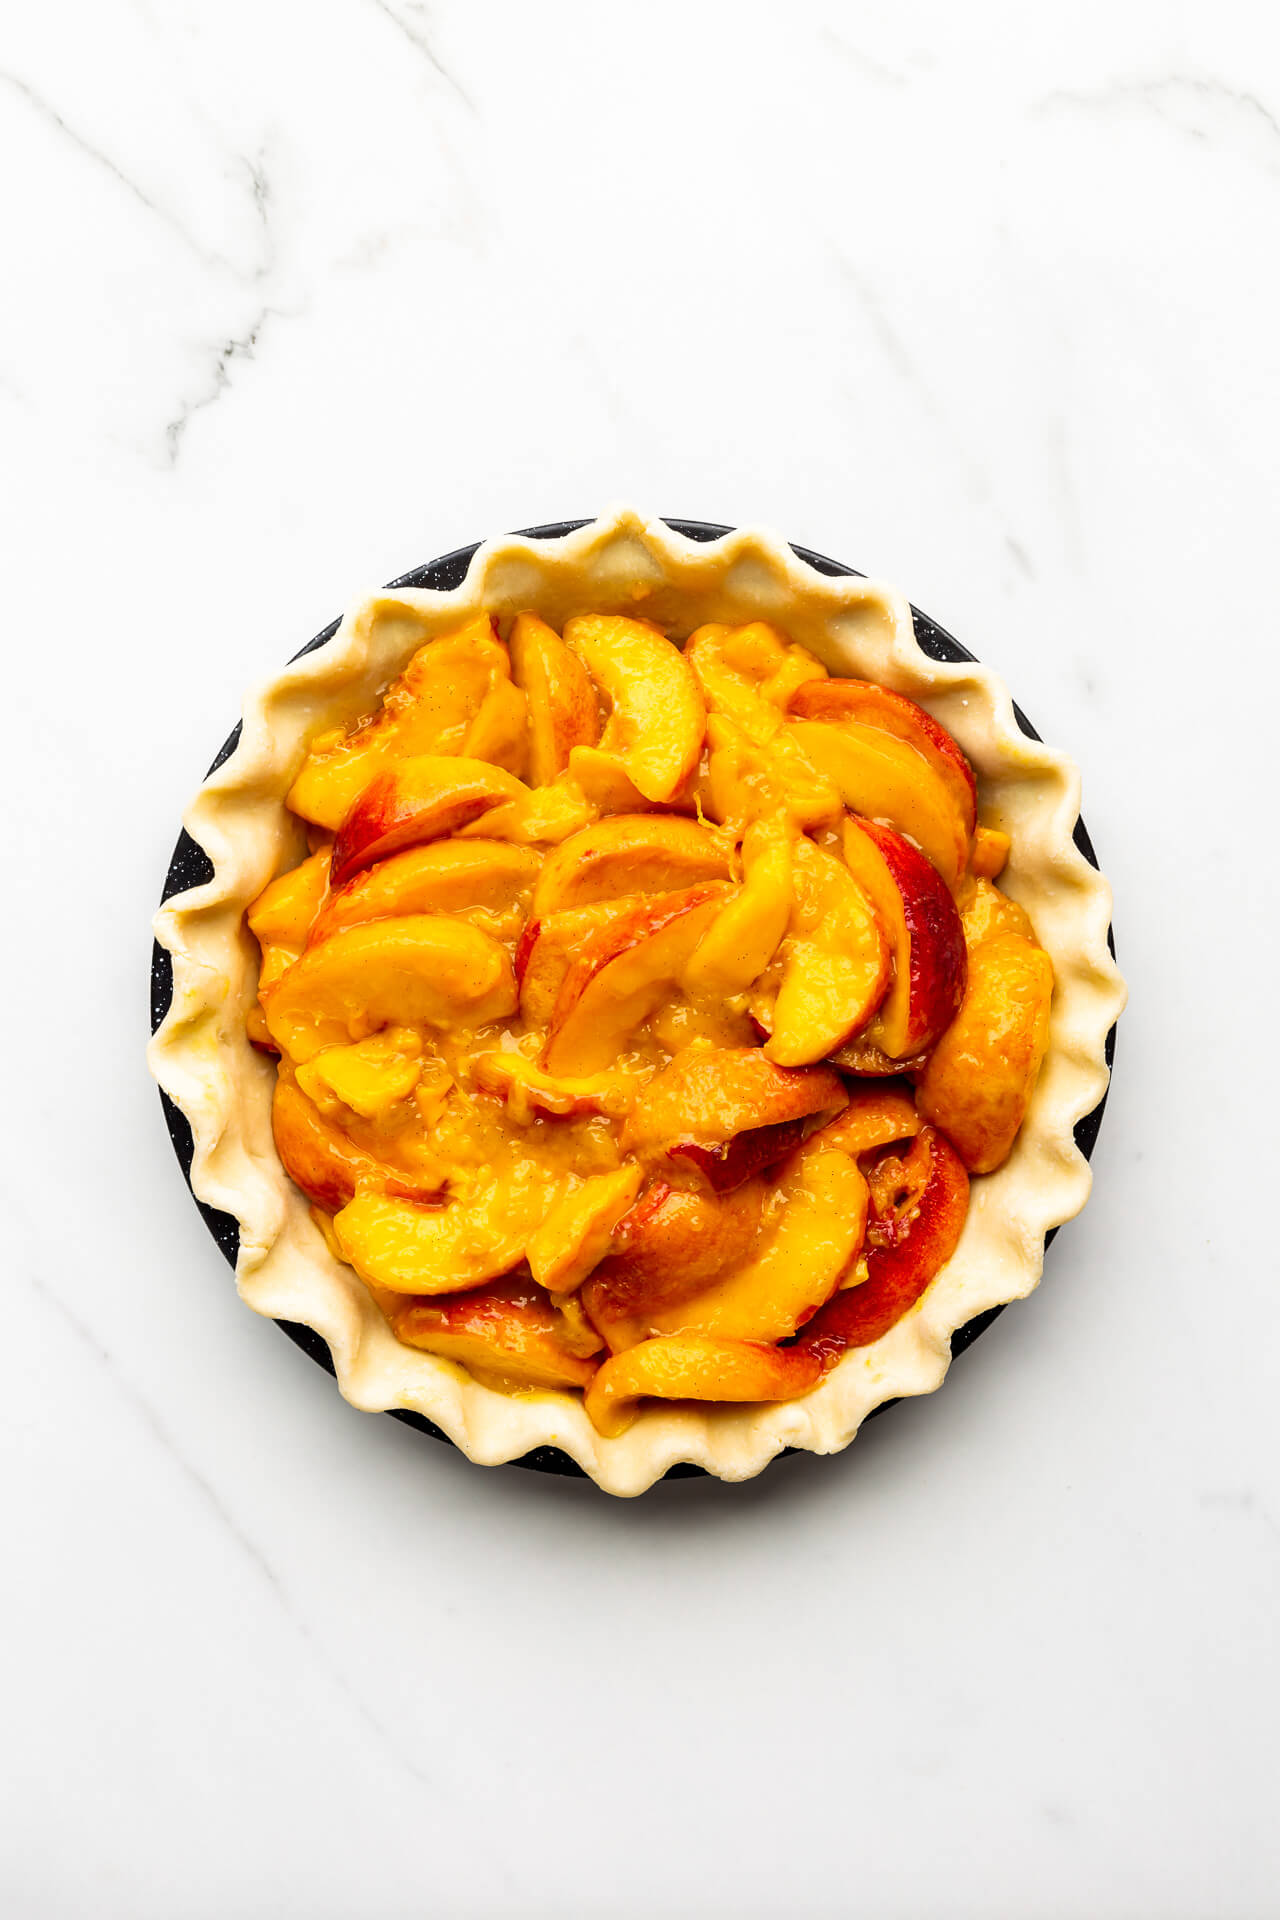 Filled peach mango pie ready for top crust